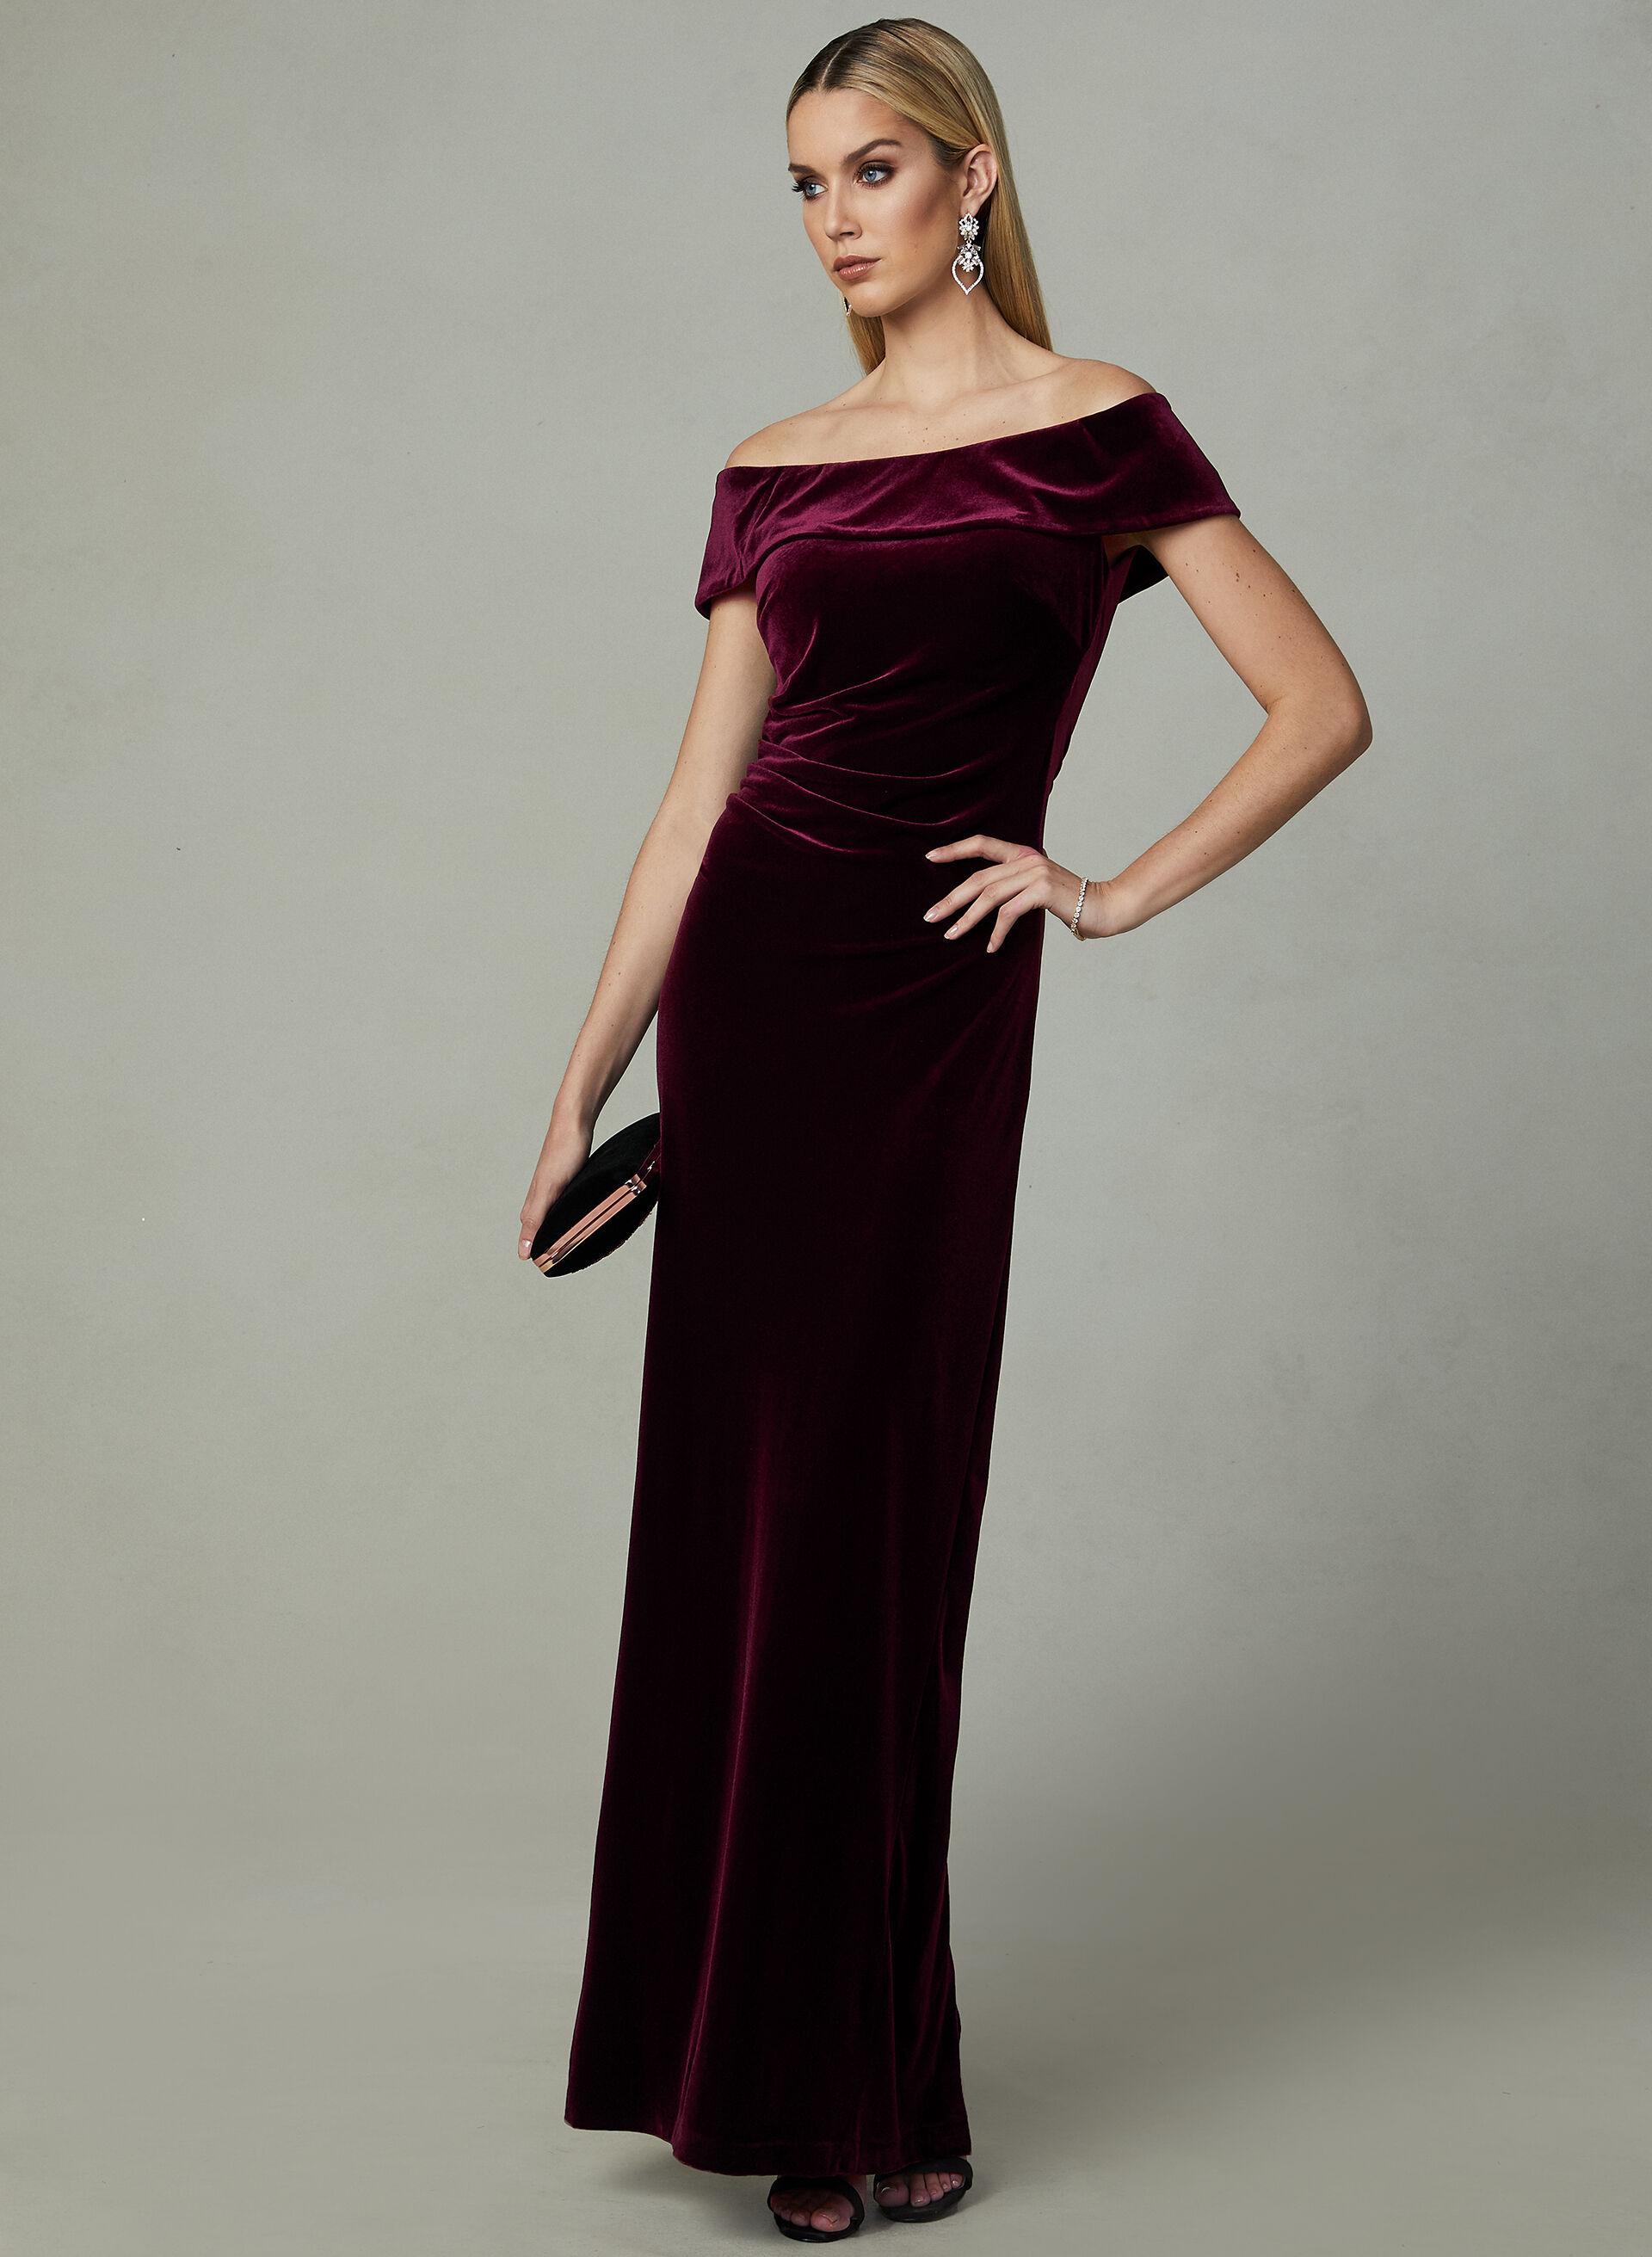 Evening Long Dresses On Sale